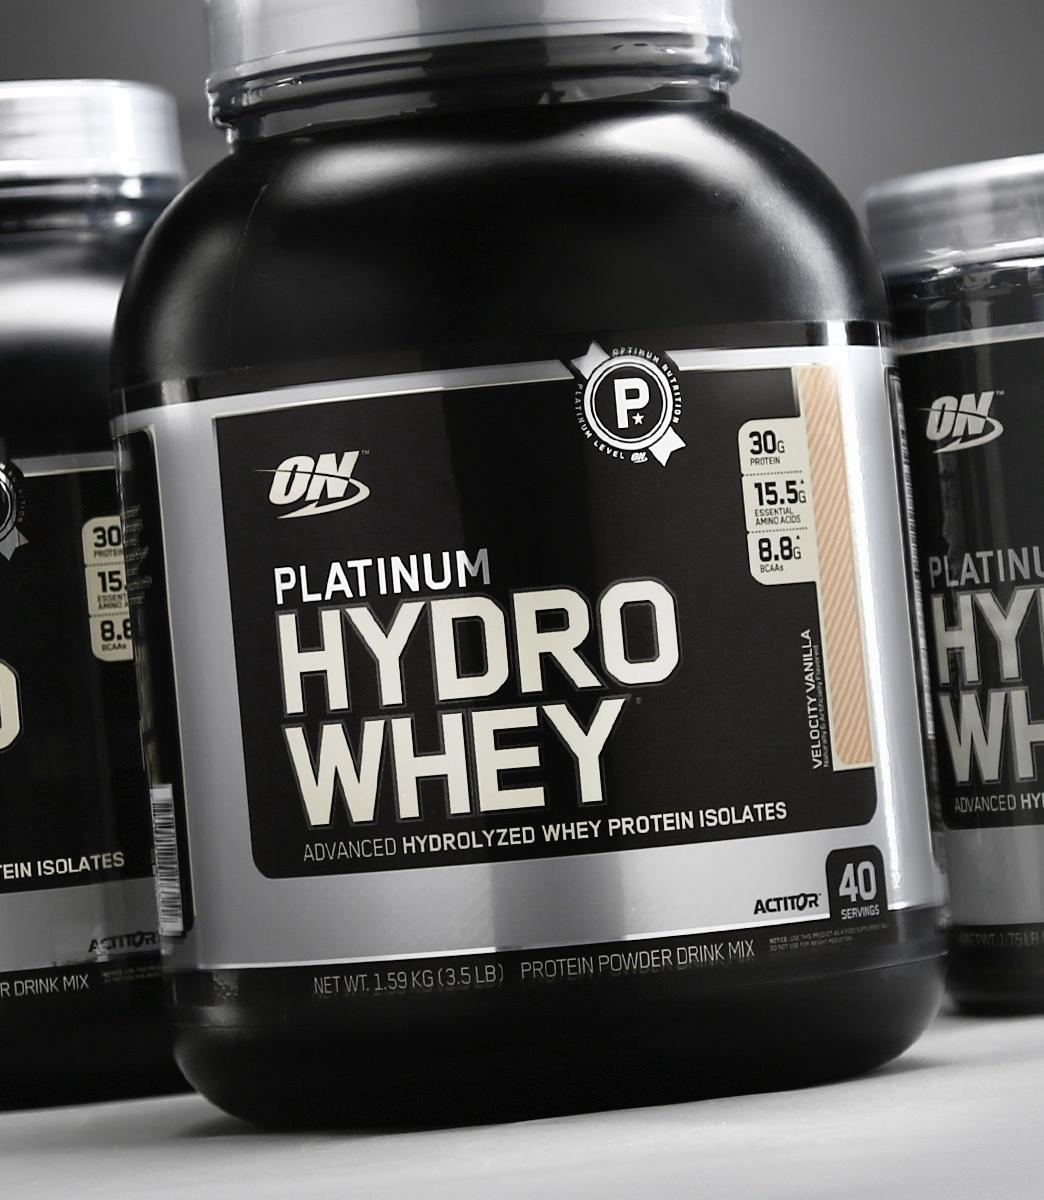 On Platinum Hydrowhey Beastmode Nutrition Brunei Muscletech Bcaa Essential Series